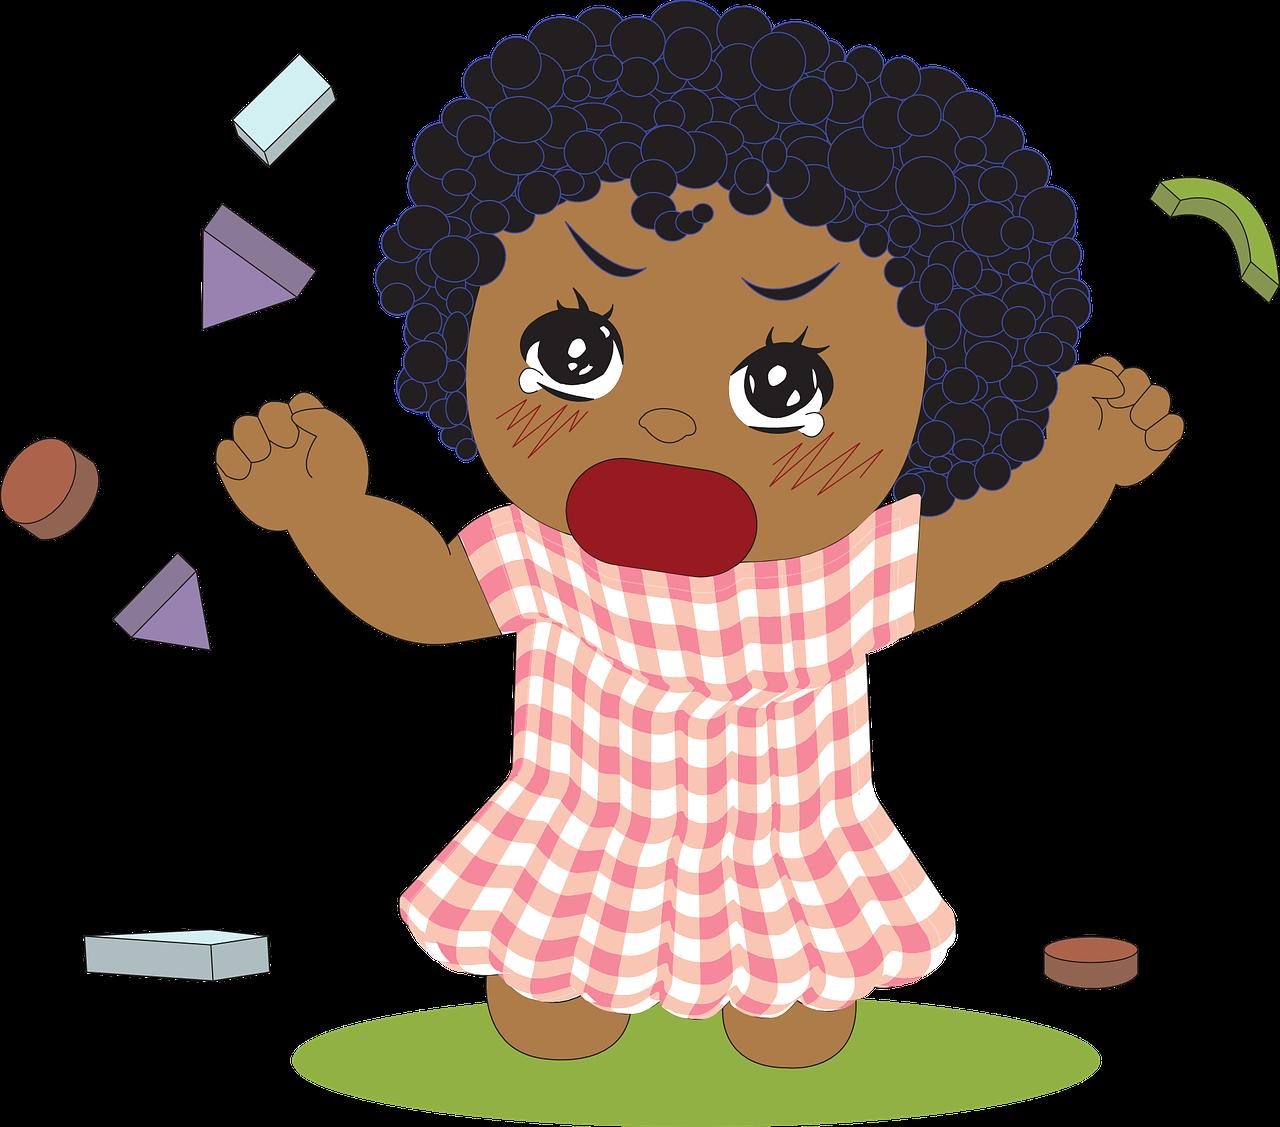 Emotions clipart childrens, Emotions childrens Transparent.